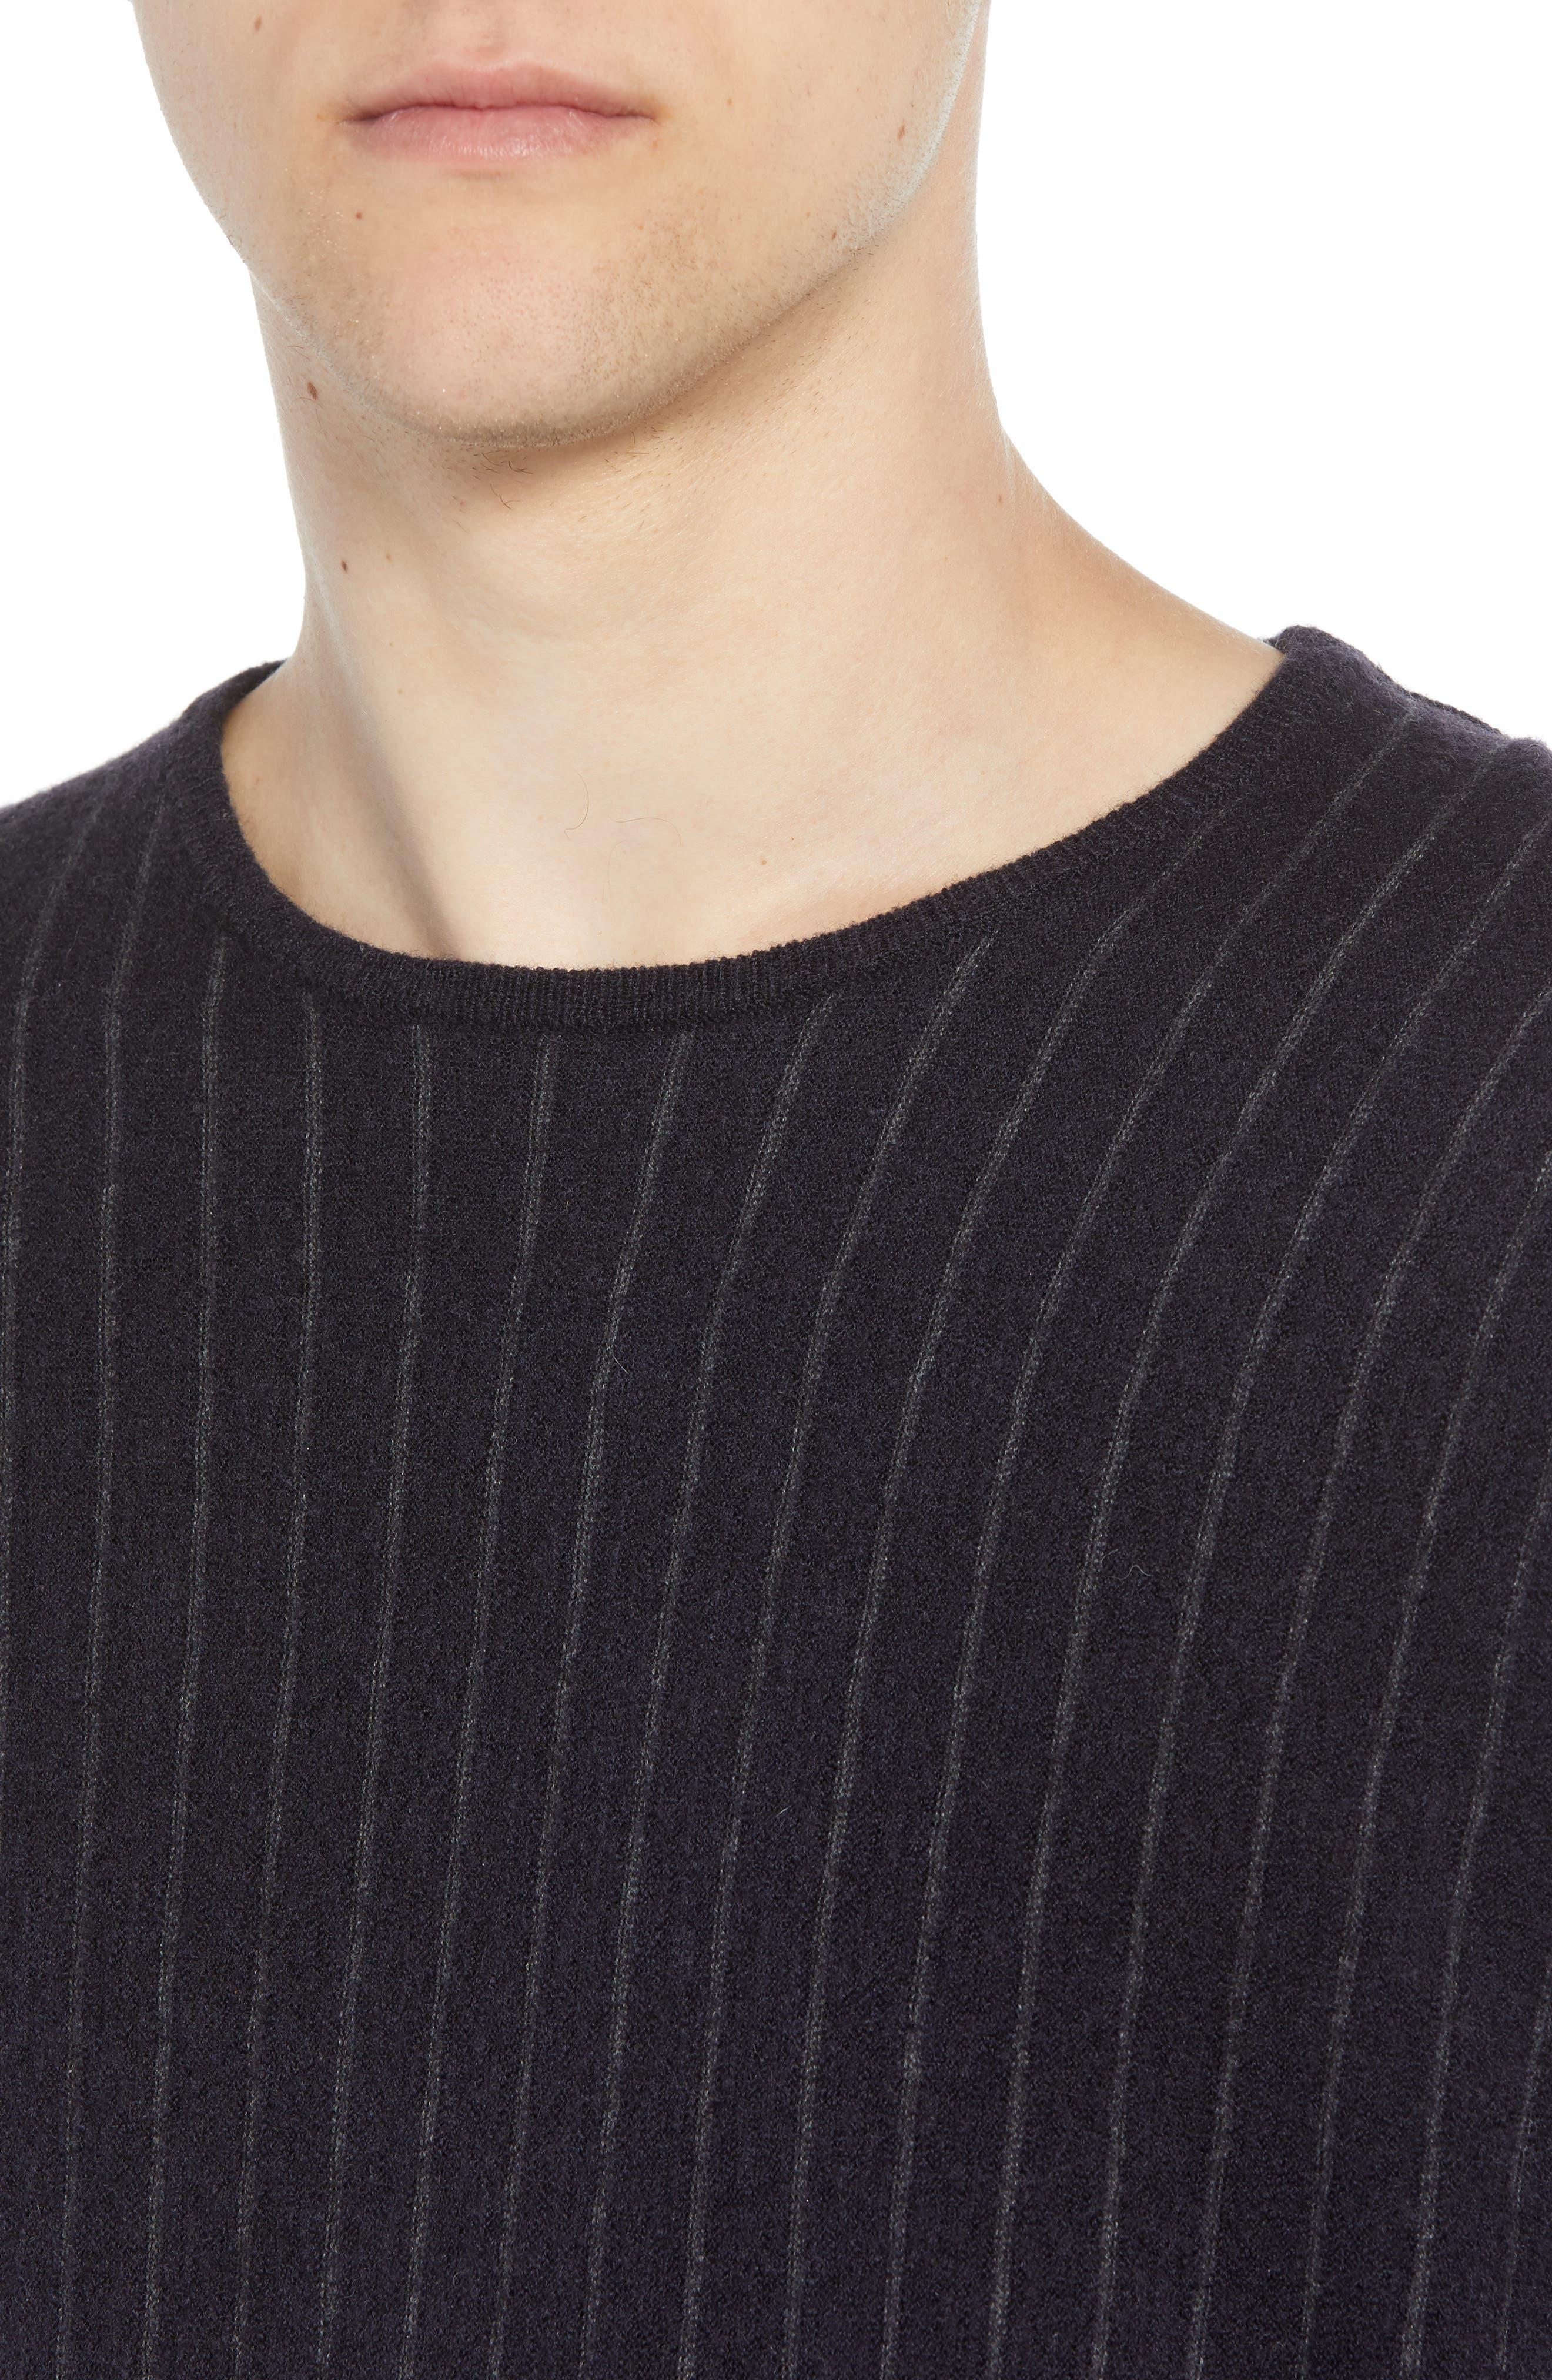 Boiled Wool Blend Crewneck Sweater,                             Alternate thumbnail 4, color,                             MULTI STRIPE